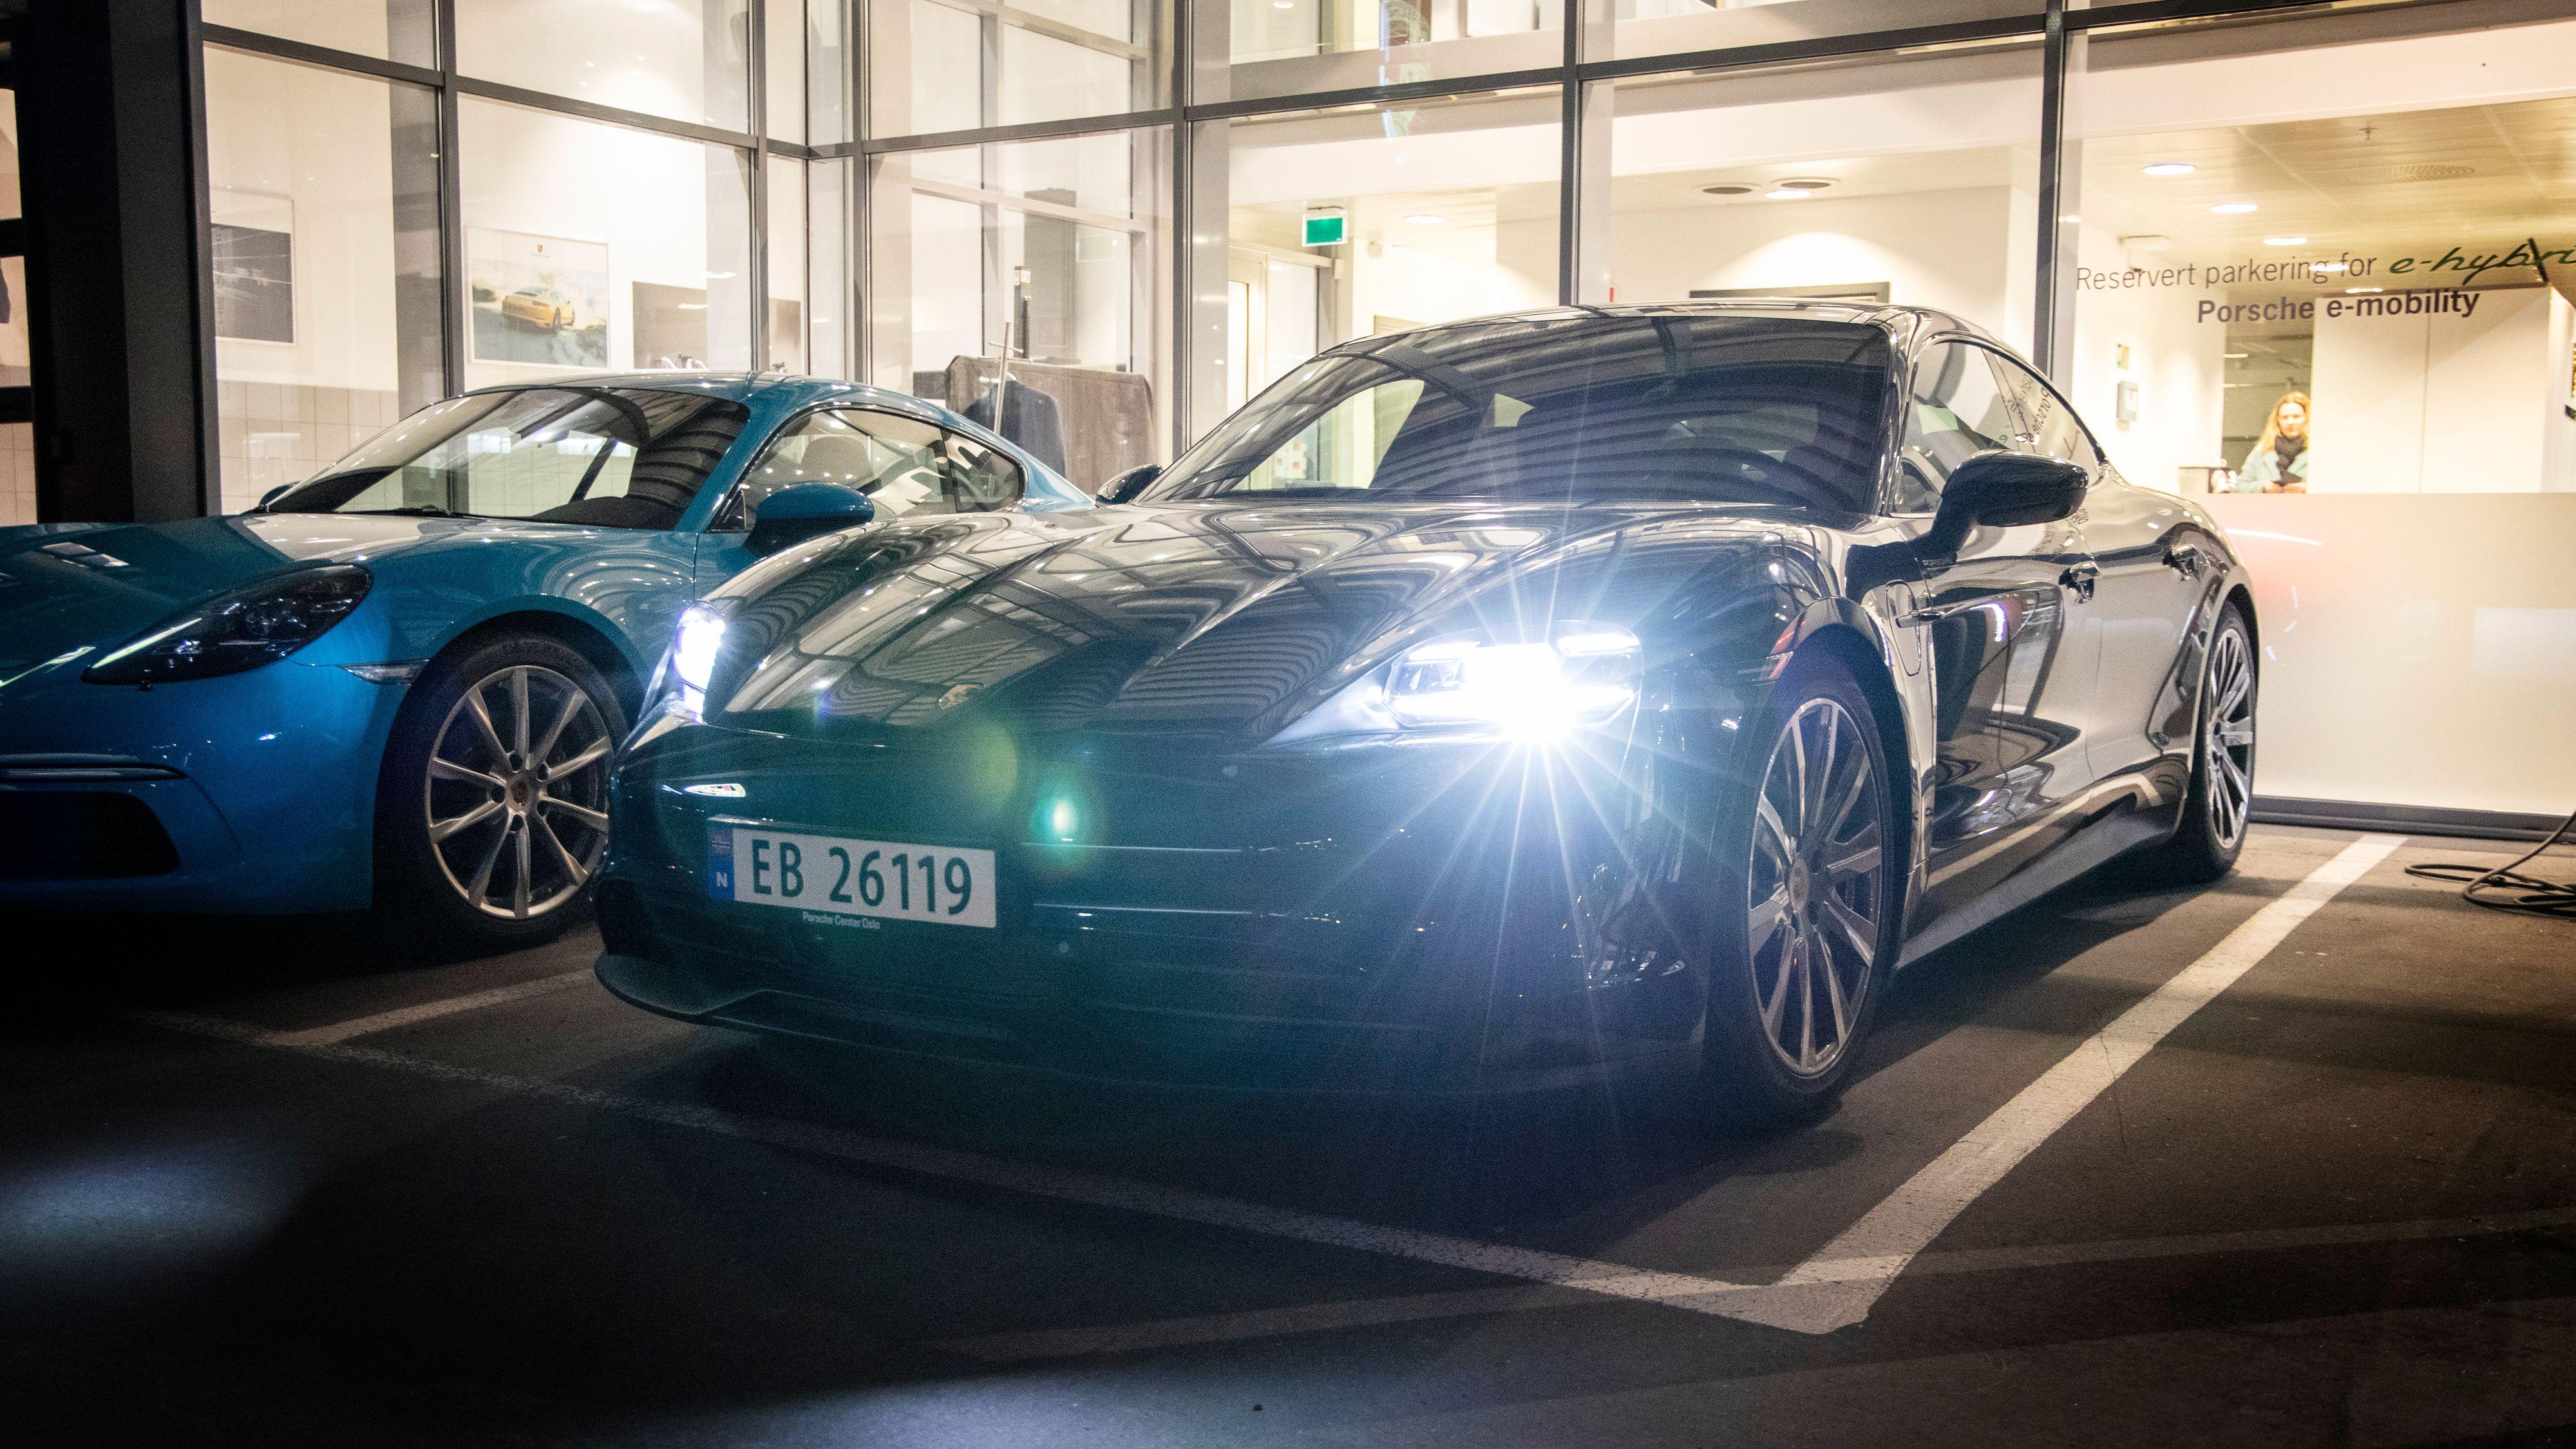 Porsche-importør Autozentrum Sport har lagt på prisen på Taycan med en god del.